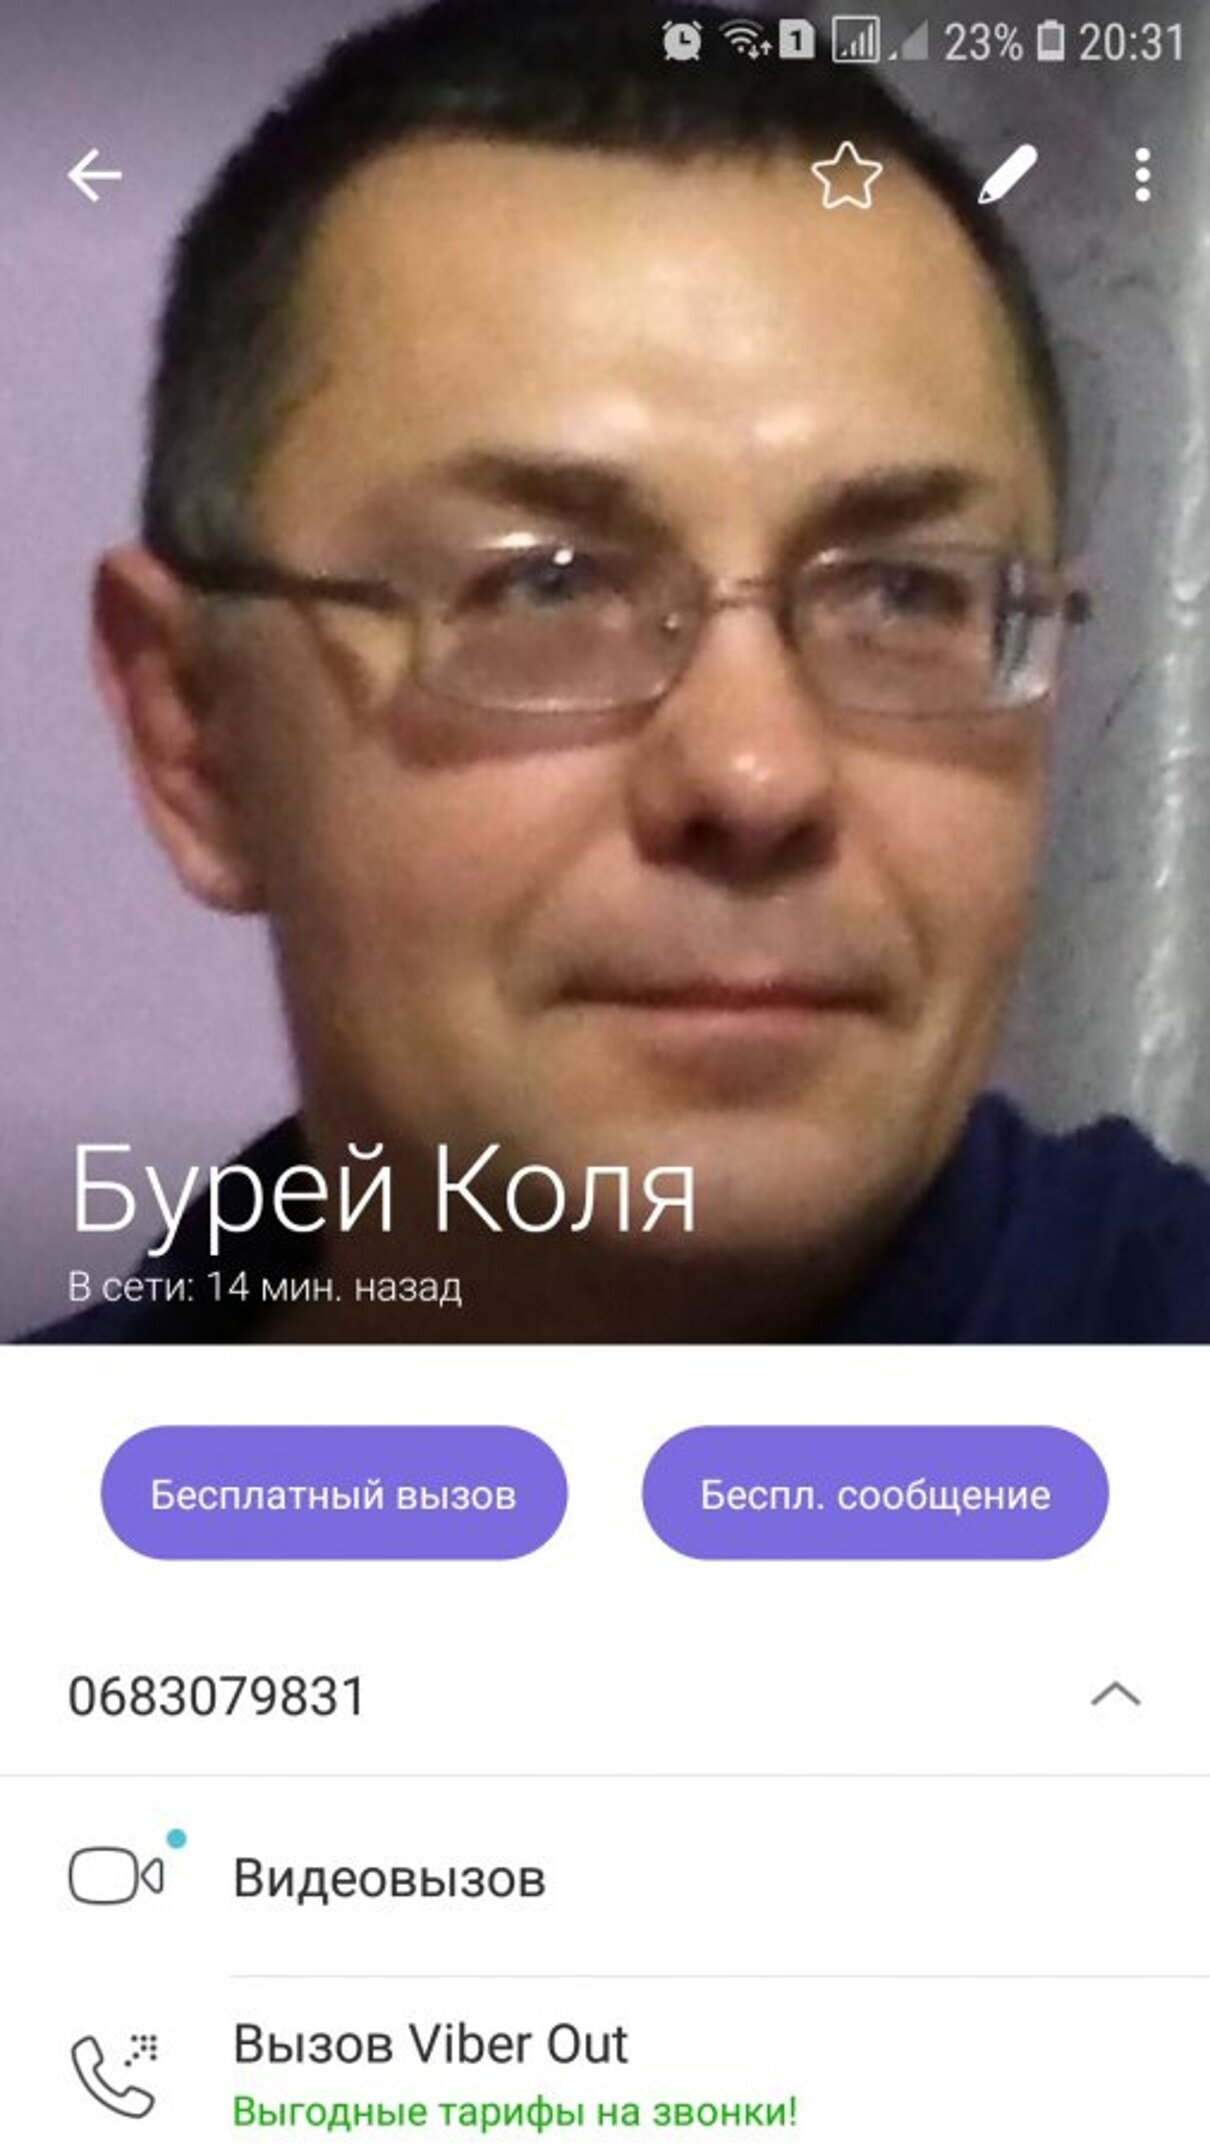 Жалоба-отзыв: БУРЕЙ МИКОЛА - Мошенник.  Фото №1